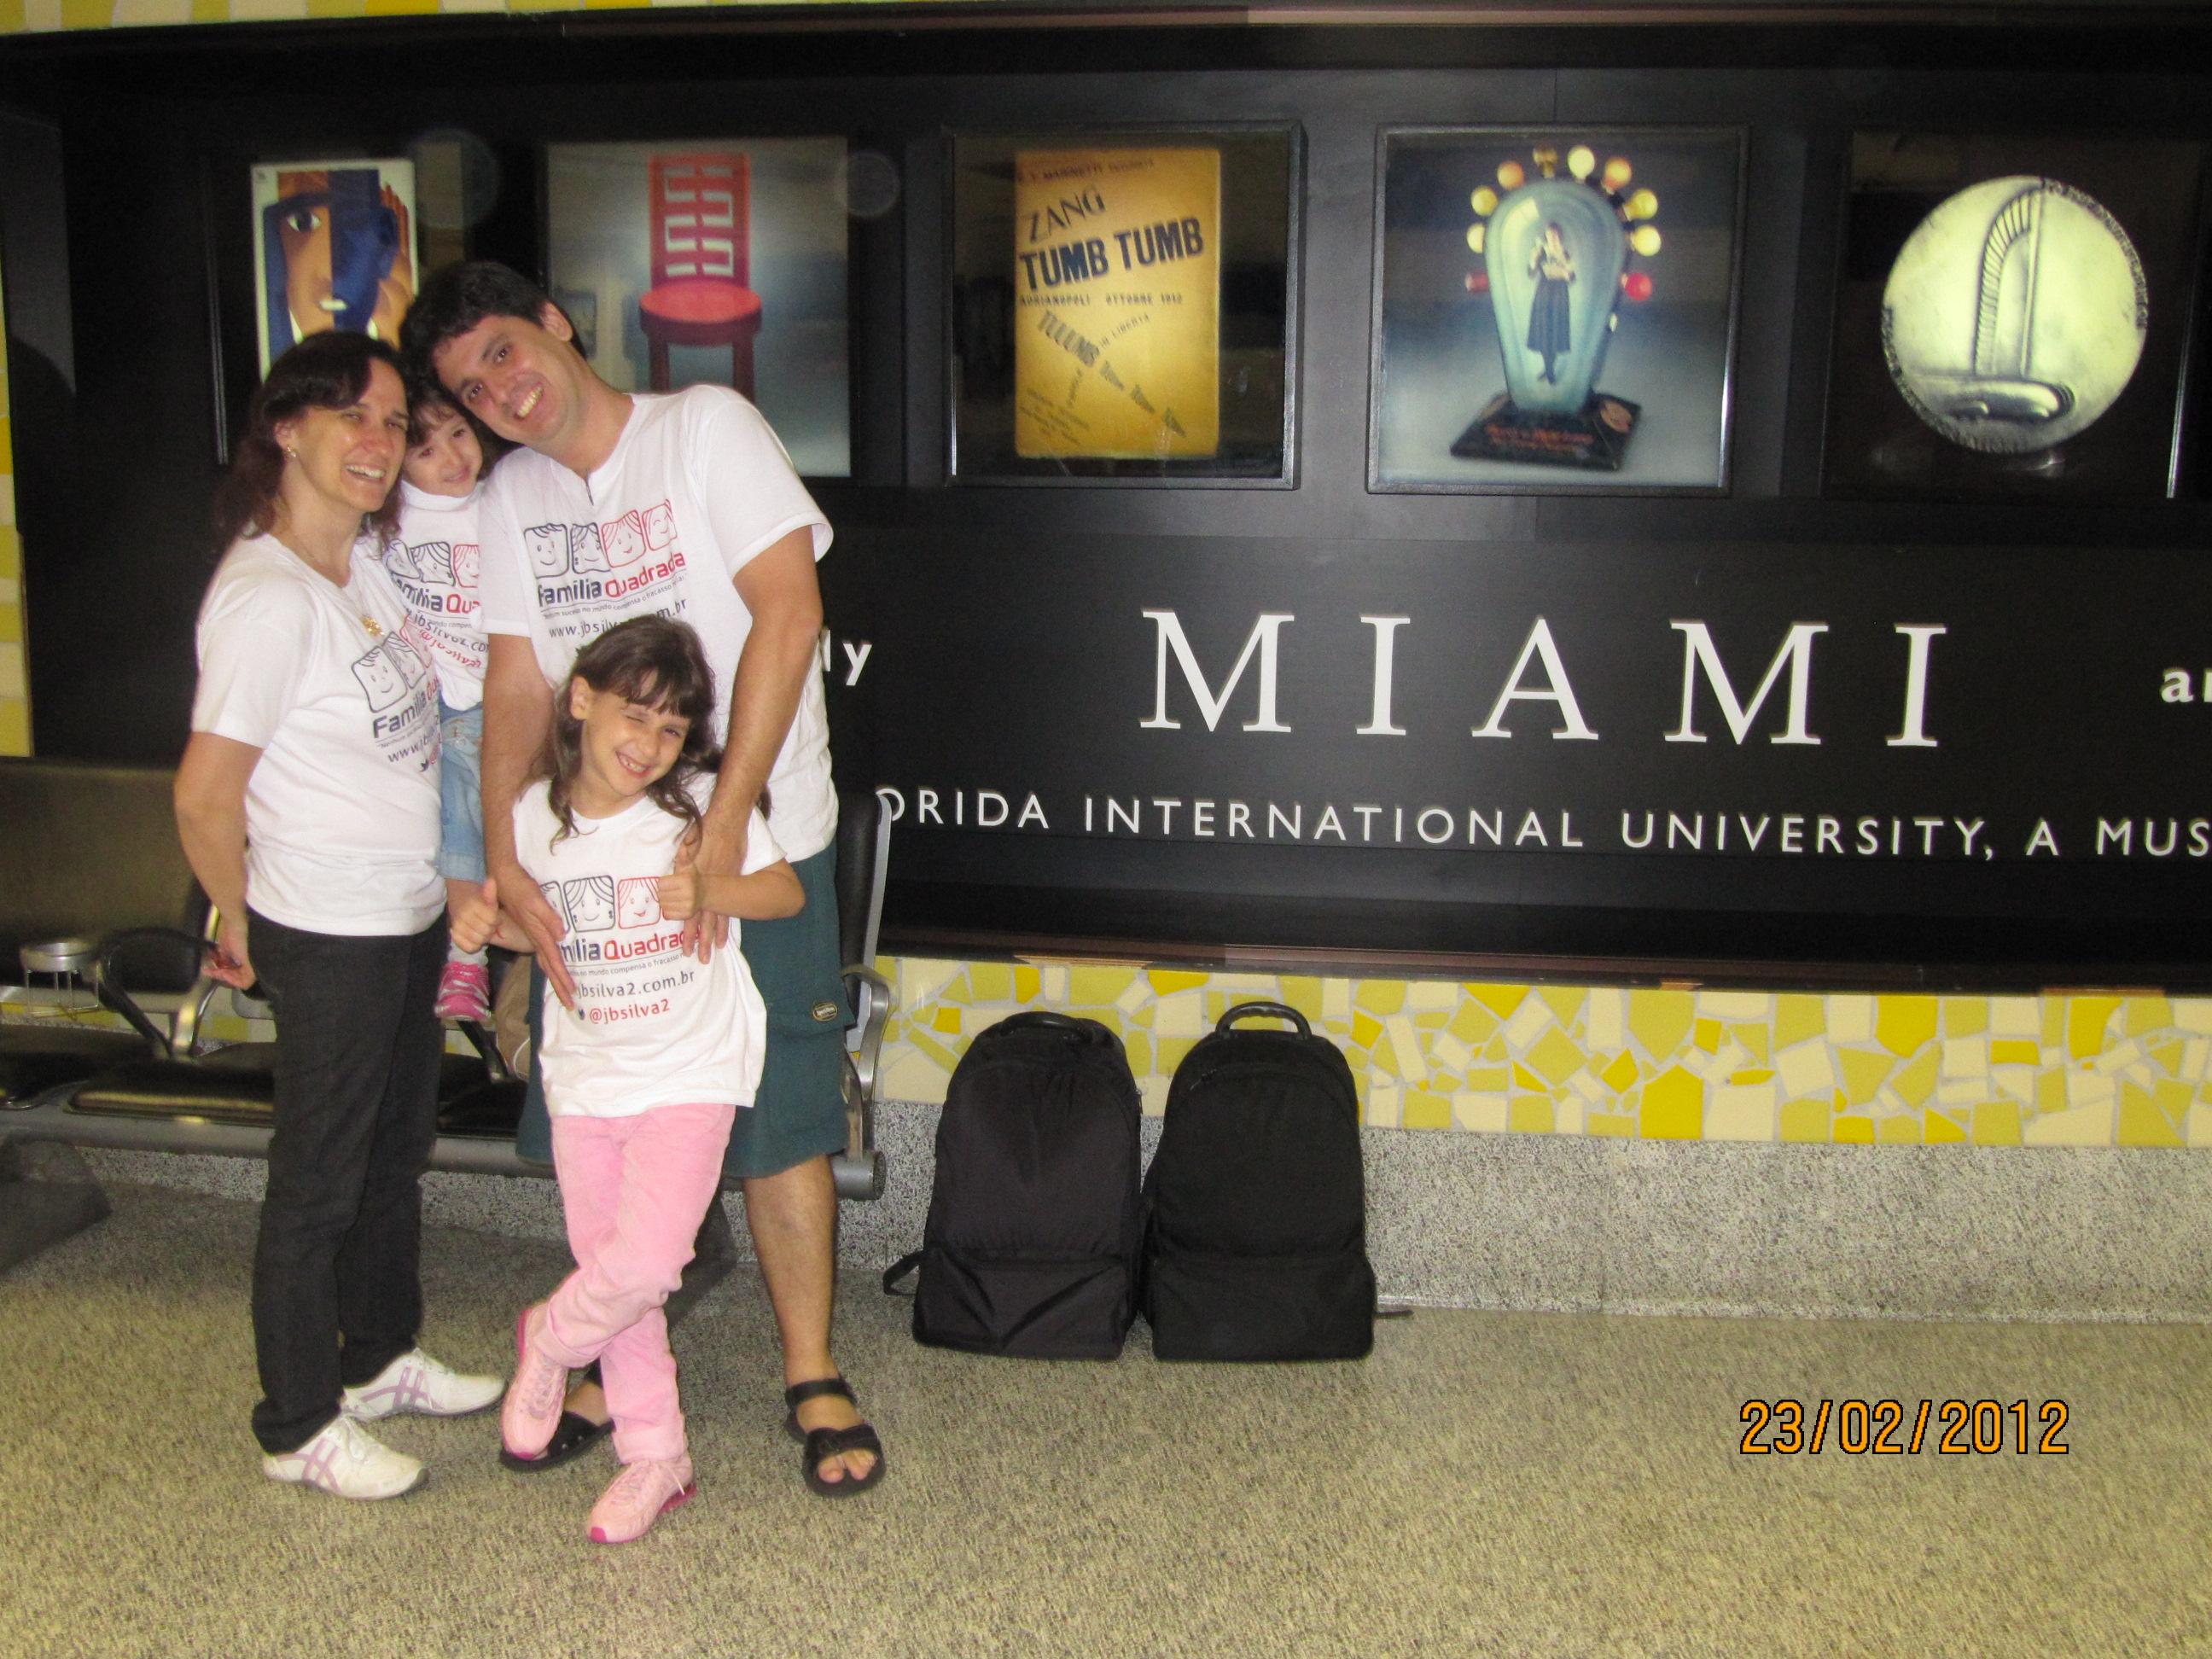 No aeroporto de Miami